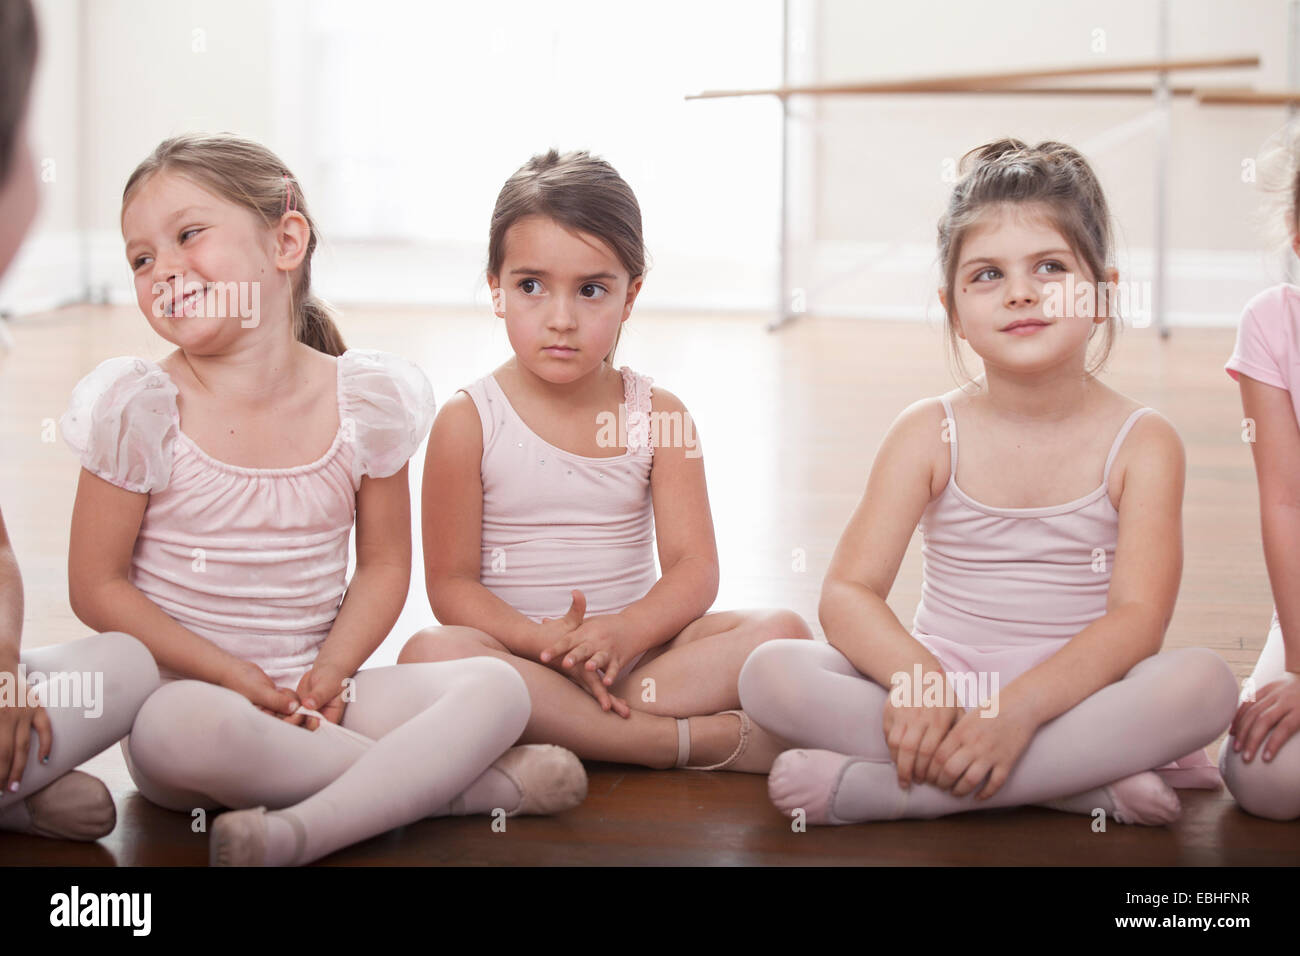 Group of girls sitting on floor in ballet school - Stock Image